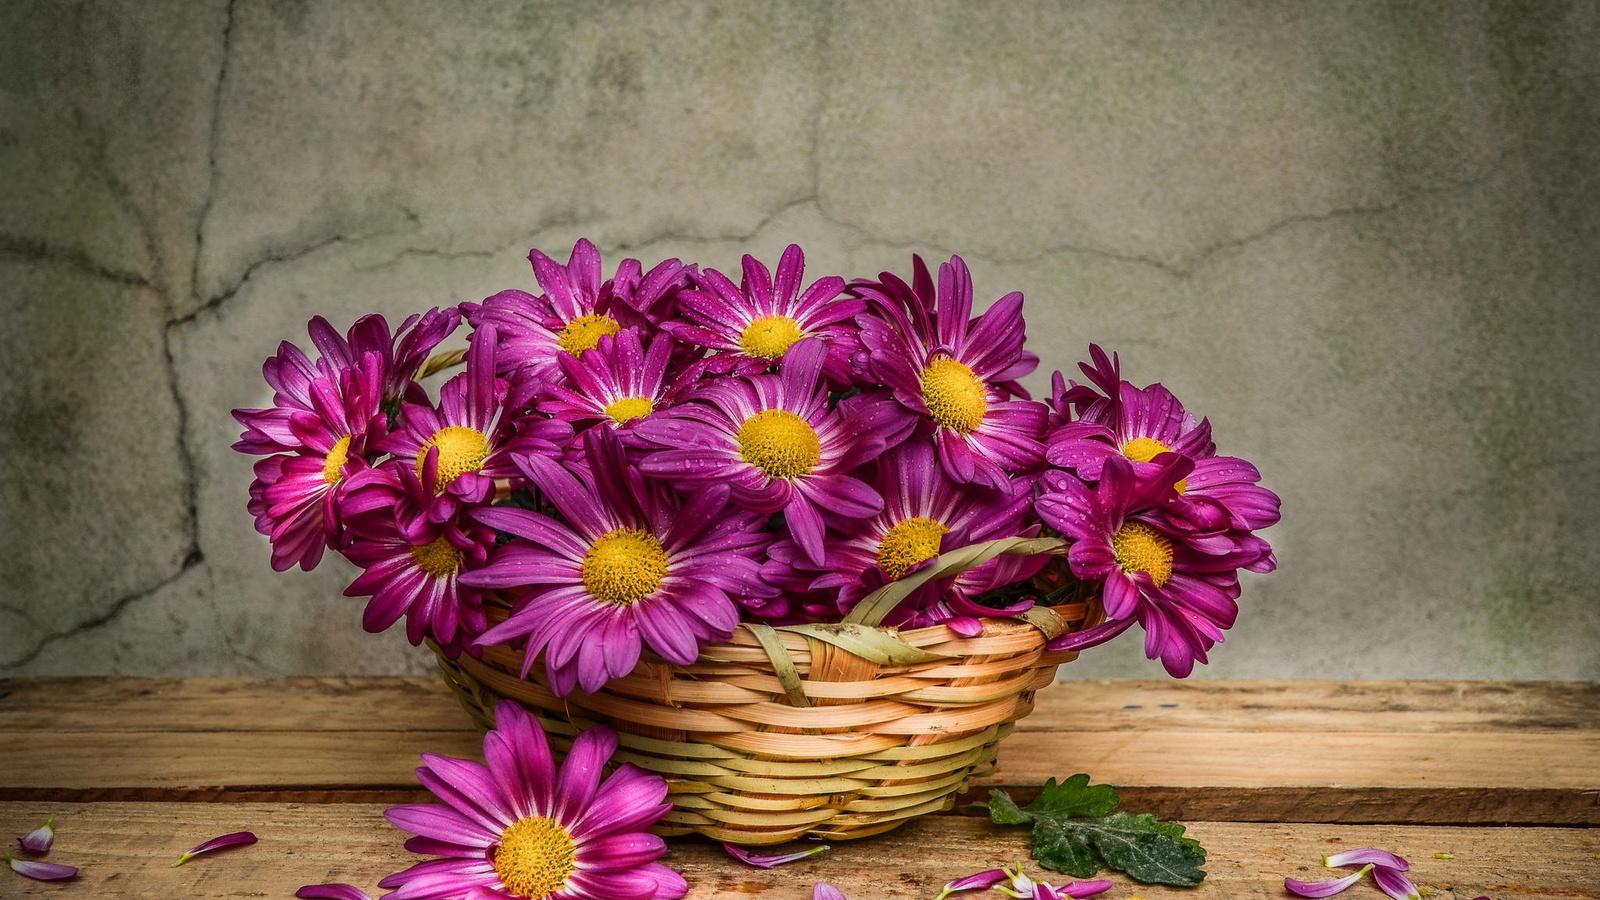 Картинка цветы открытка маме